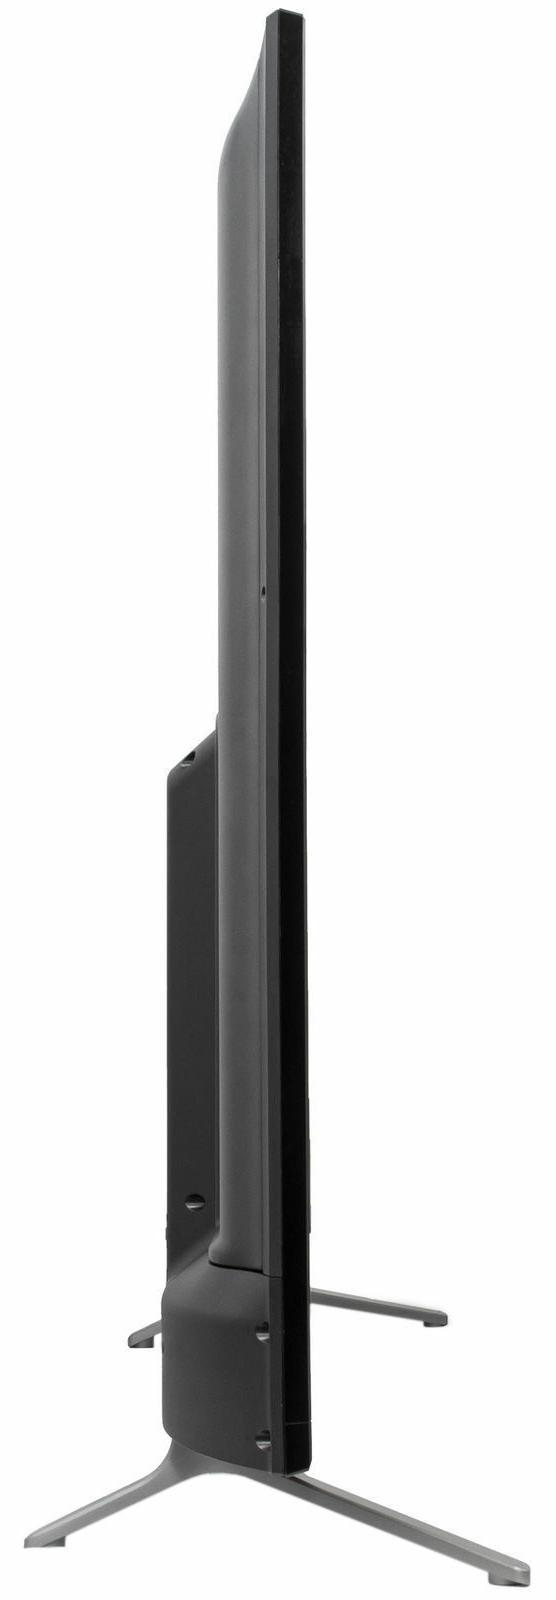 55 inch Ultra HD TV Slim Flat 60 2160p Bedroom